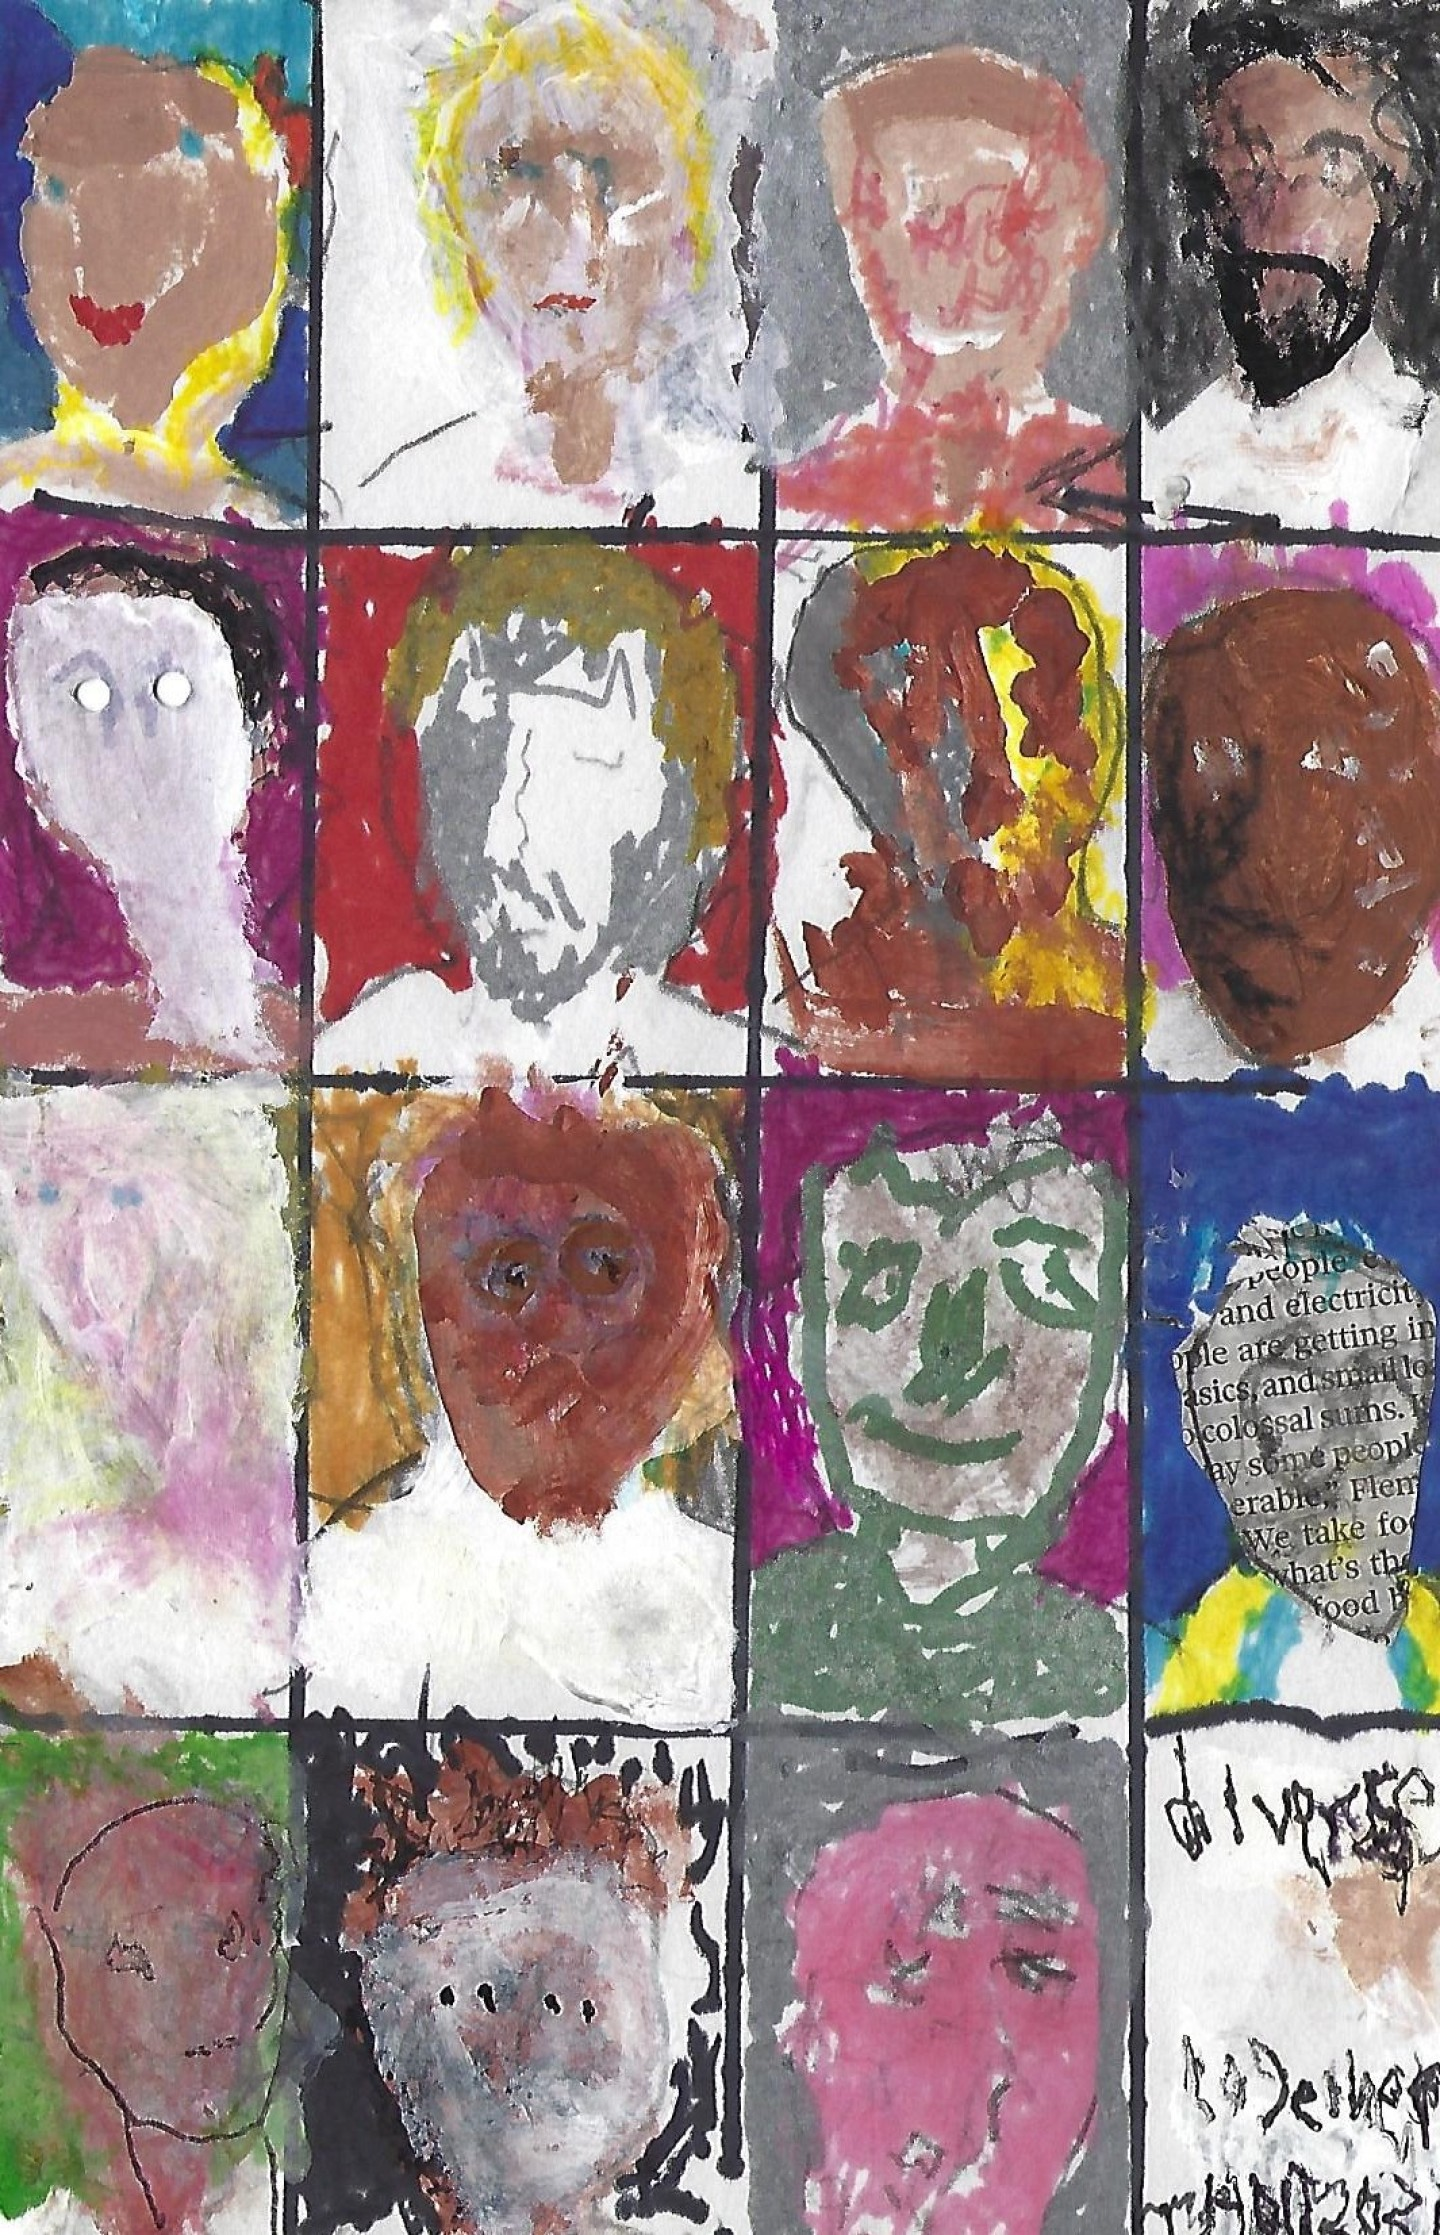 Diversity by Tim Holt